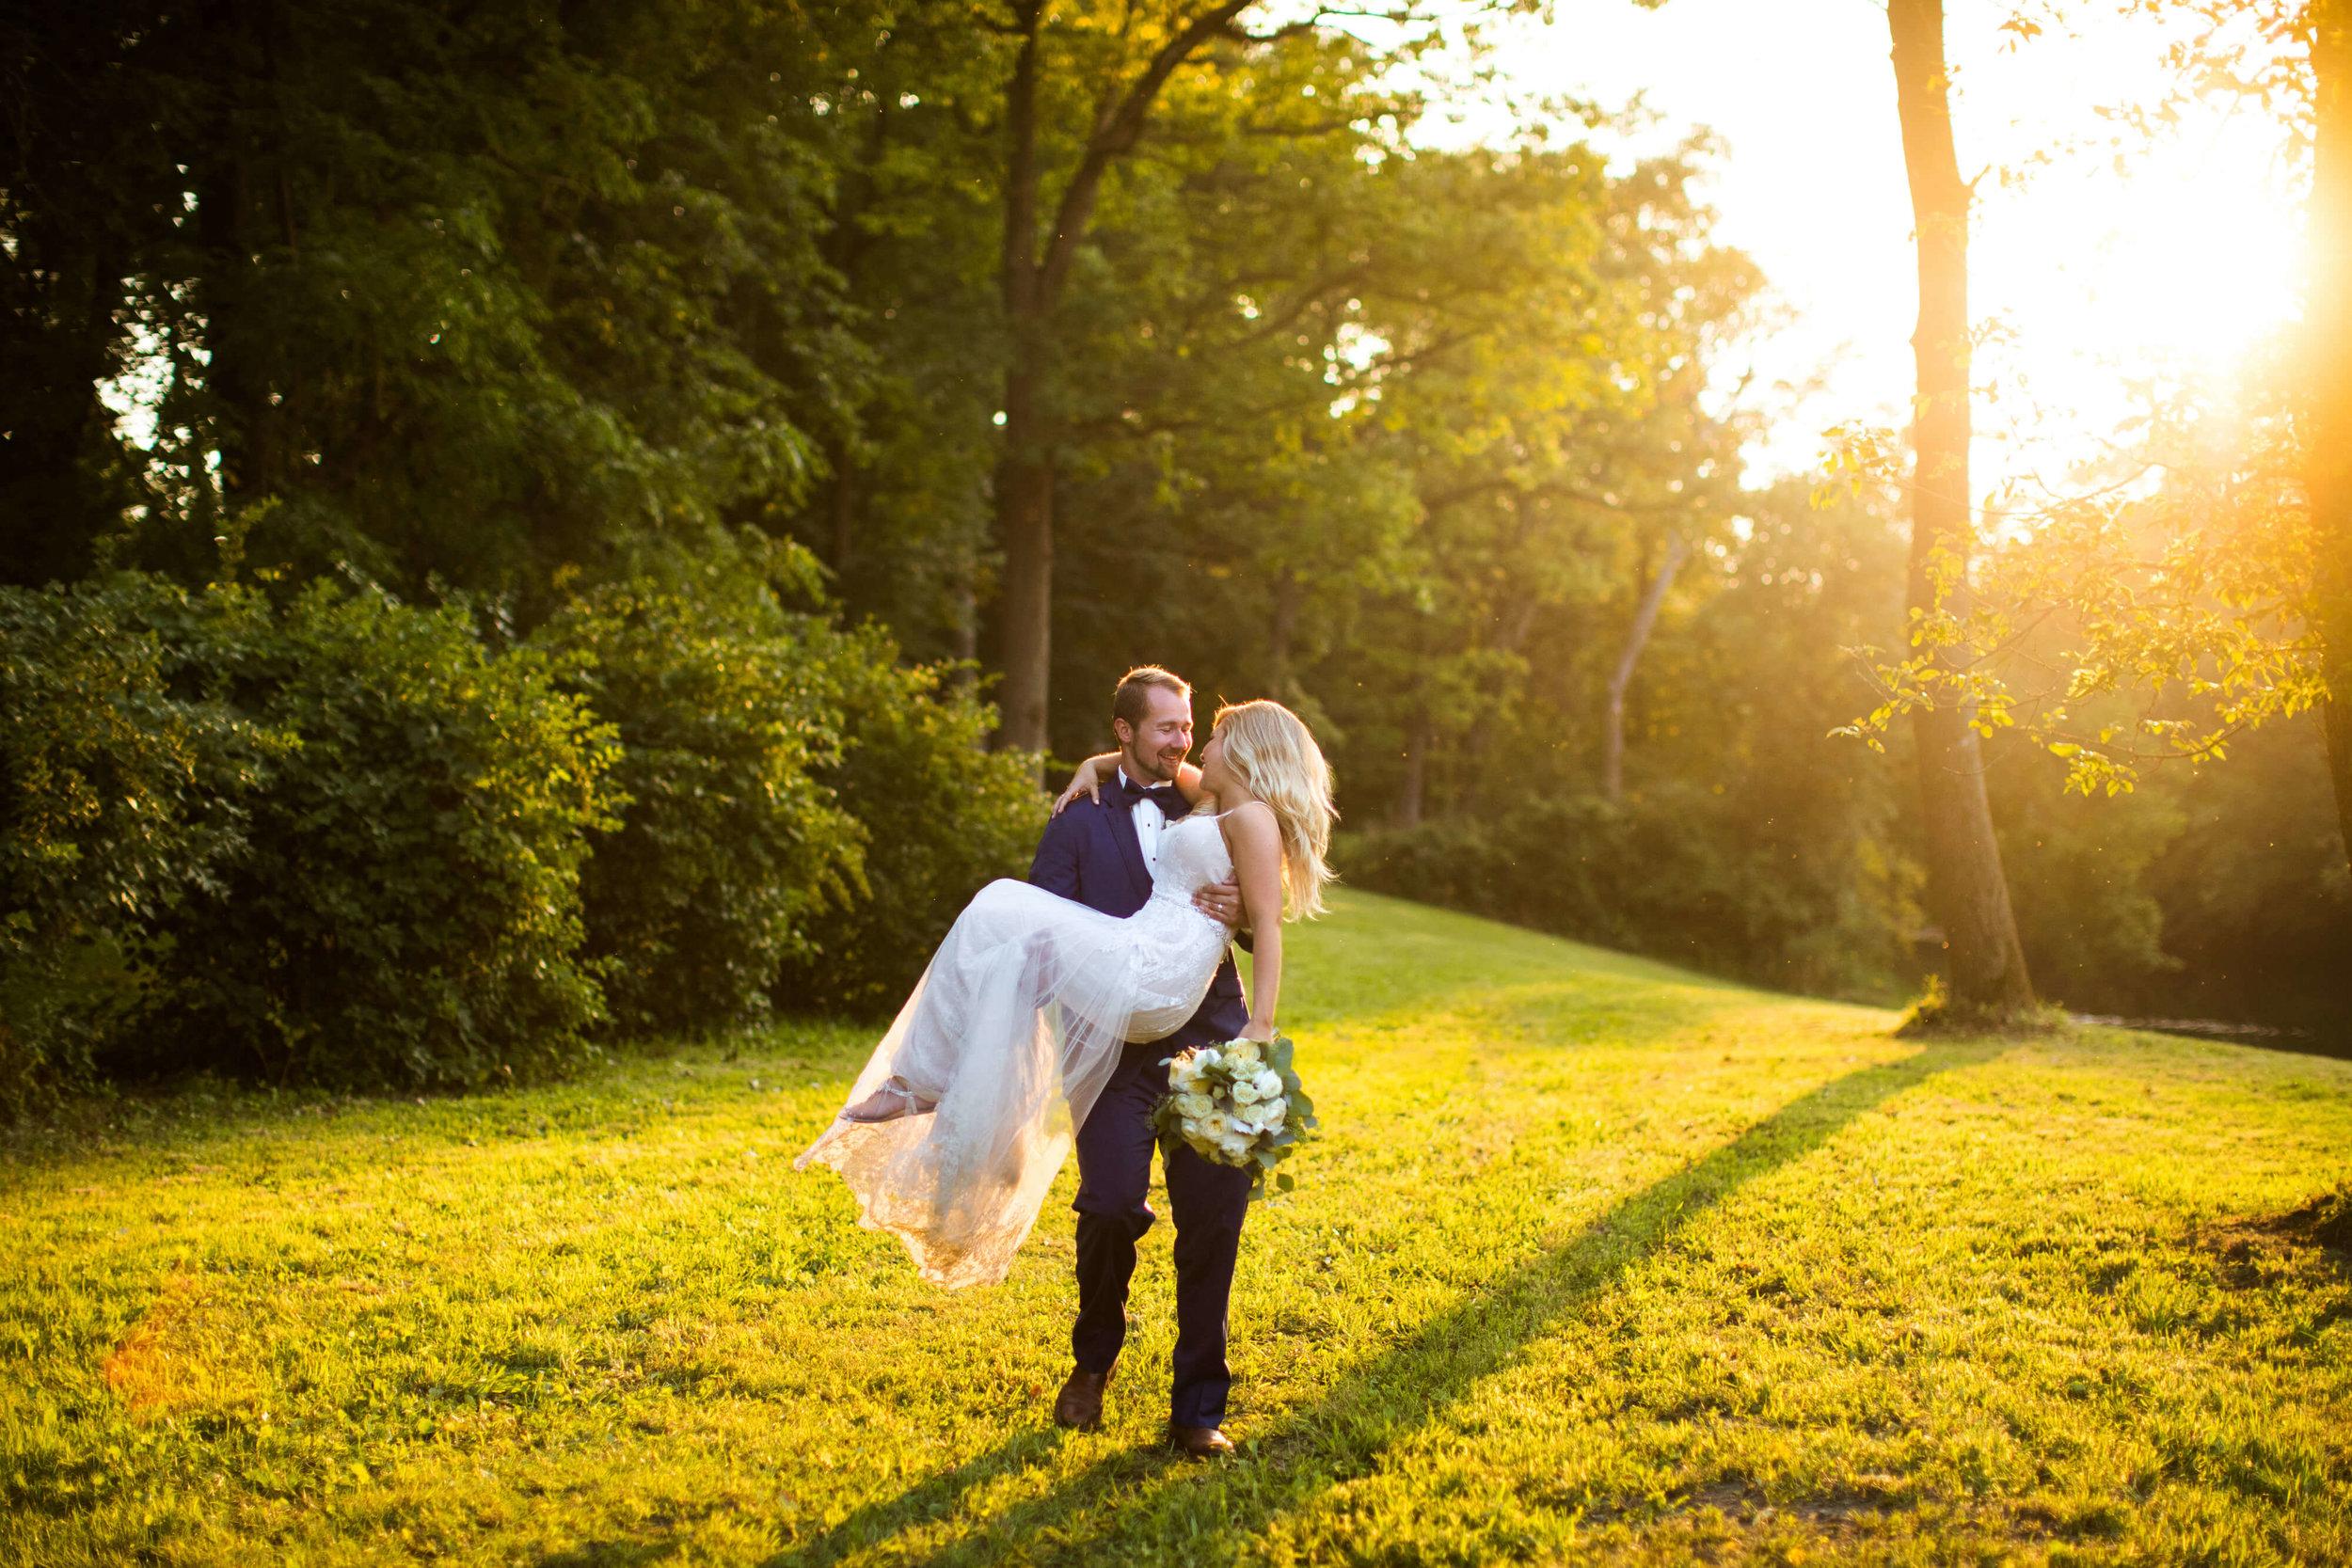 groom carrying bride golden hour | Minnesota wedding photographer Studio KH wedding dress details | wedding blog | Sixpence Events 70 Ways to Photograph Your Wedding Dress.jpg